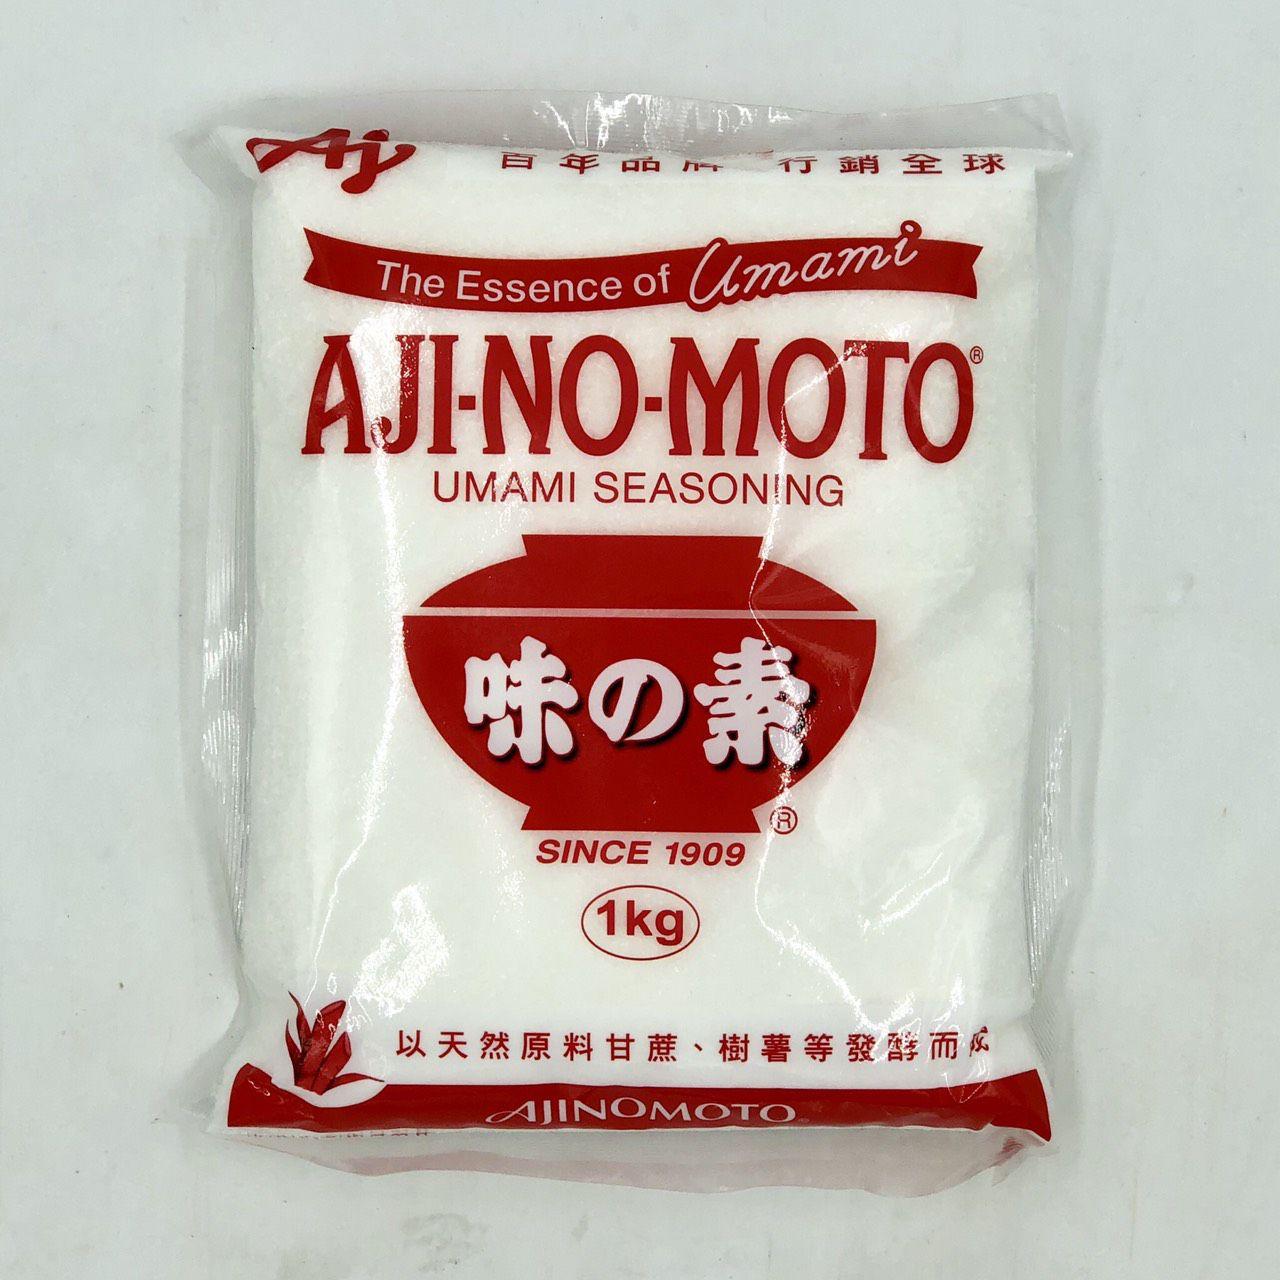 (AJI-NO-MOTO)味之素1kg(全素)